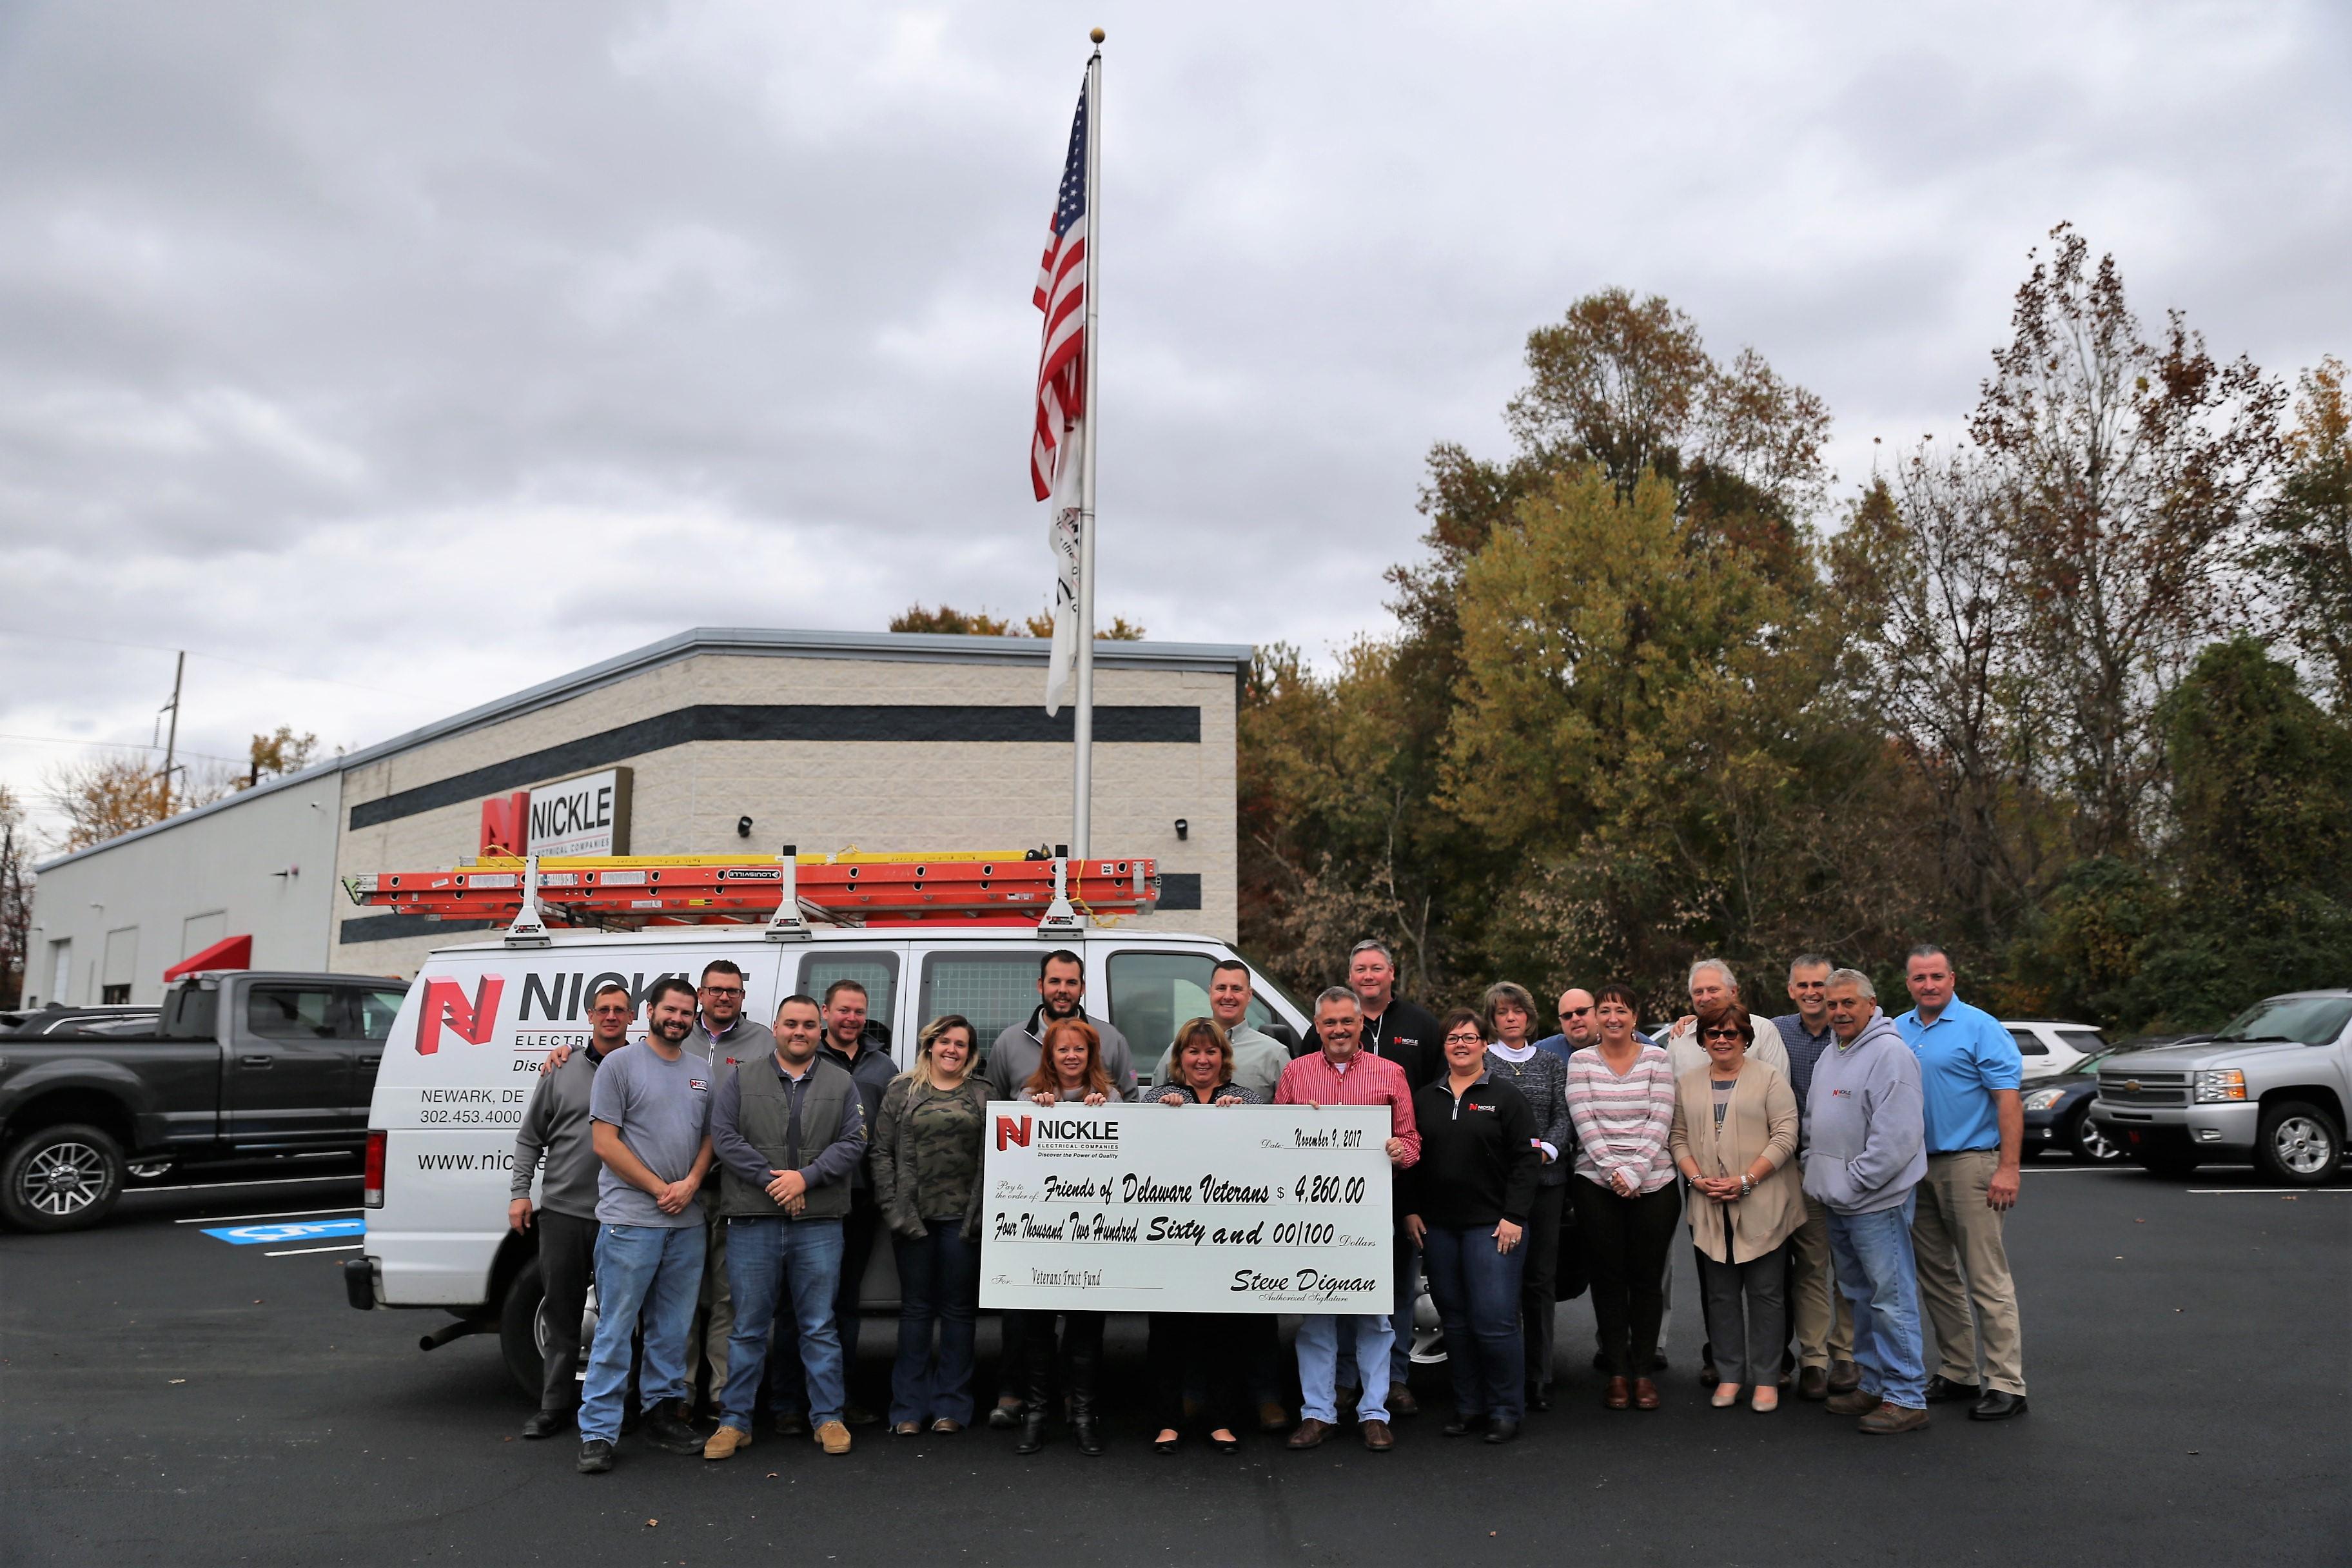 Nickle donates $4,260 to Delaware Veterans Trust Fund